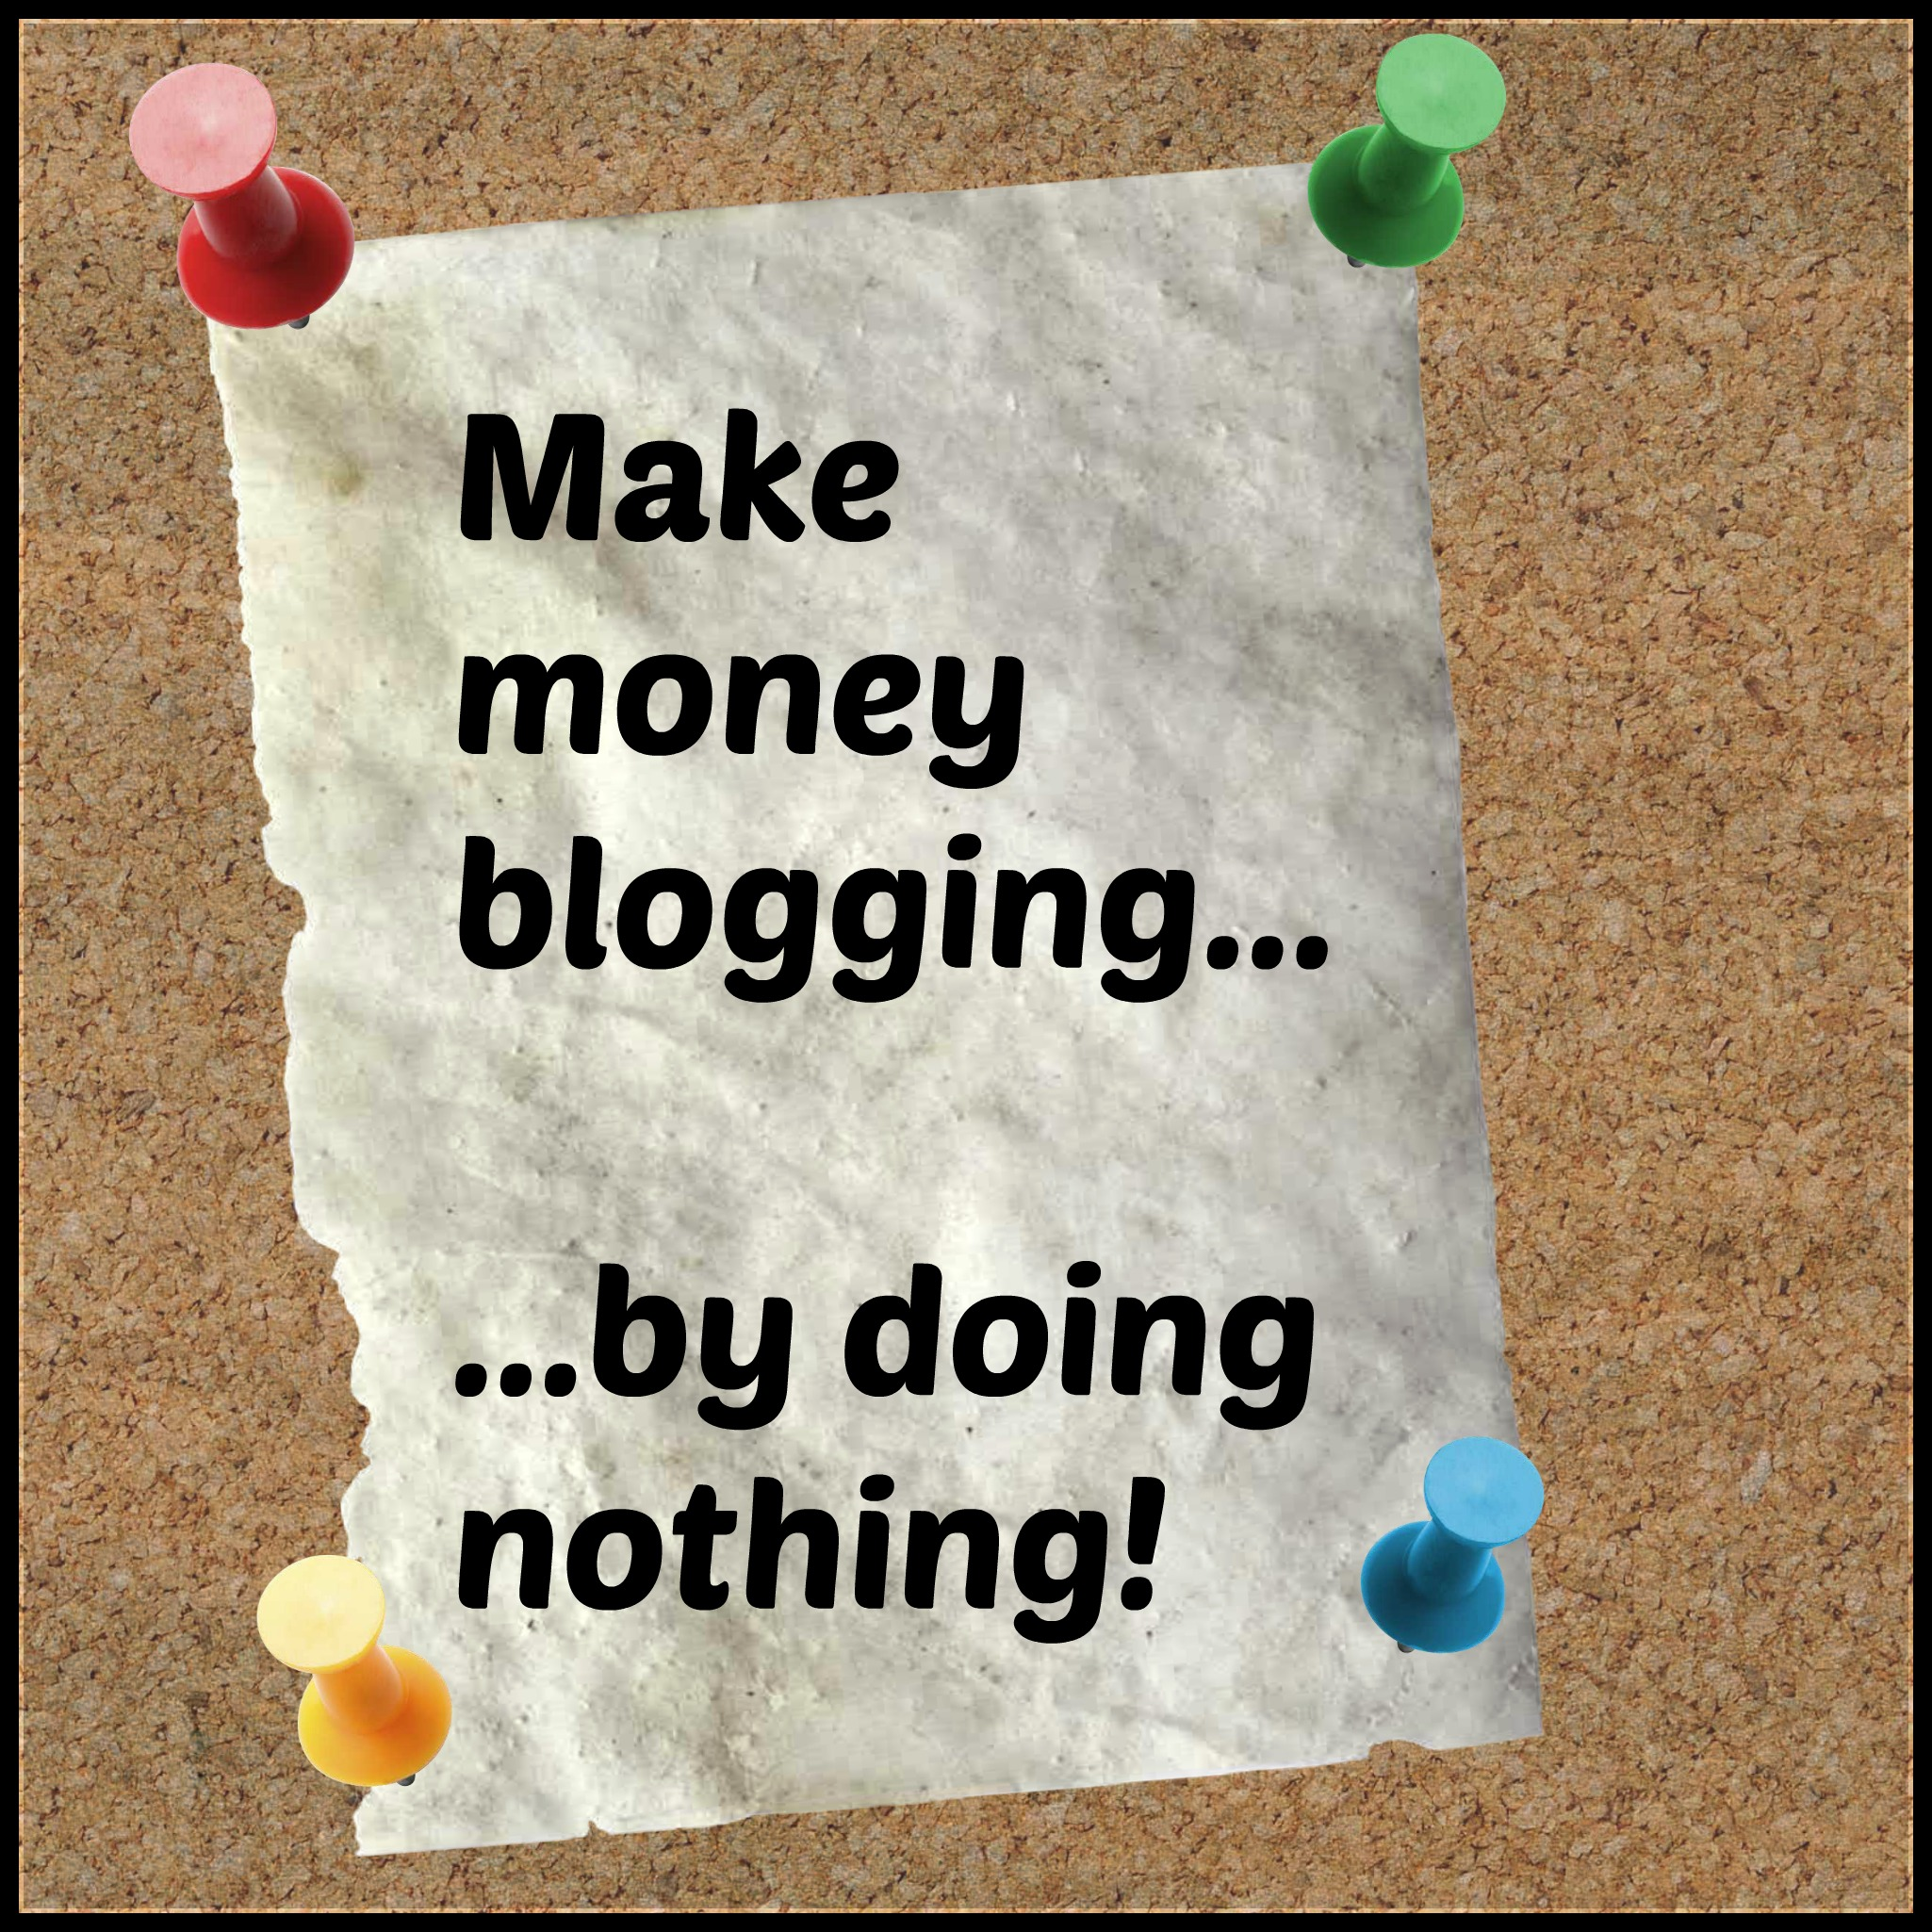 Make money blogging note on corkboard